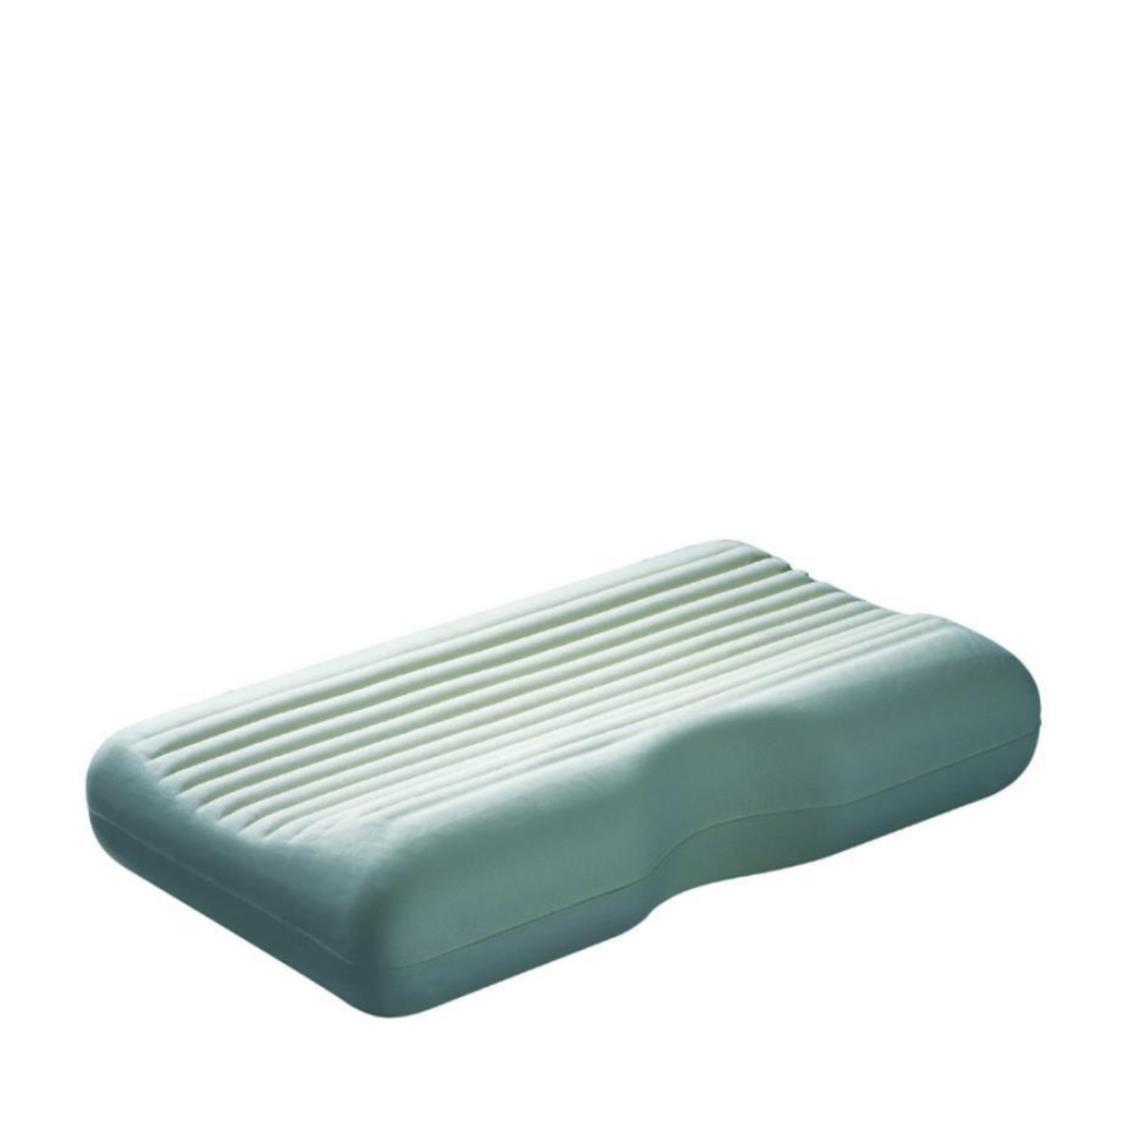 Dentons Therapeutic Pillow MediRest